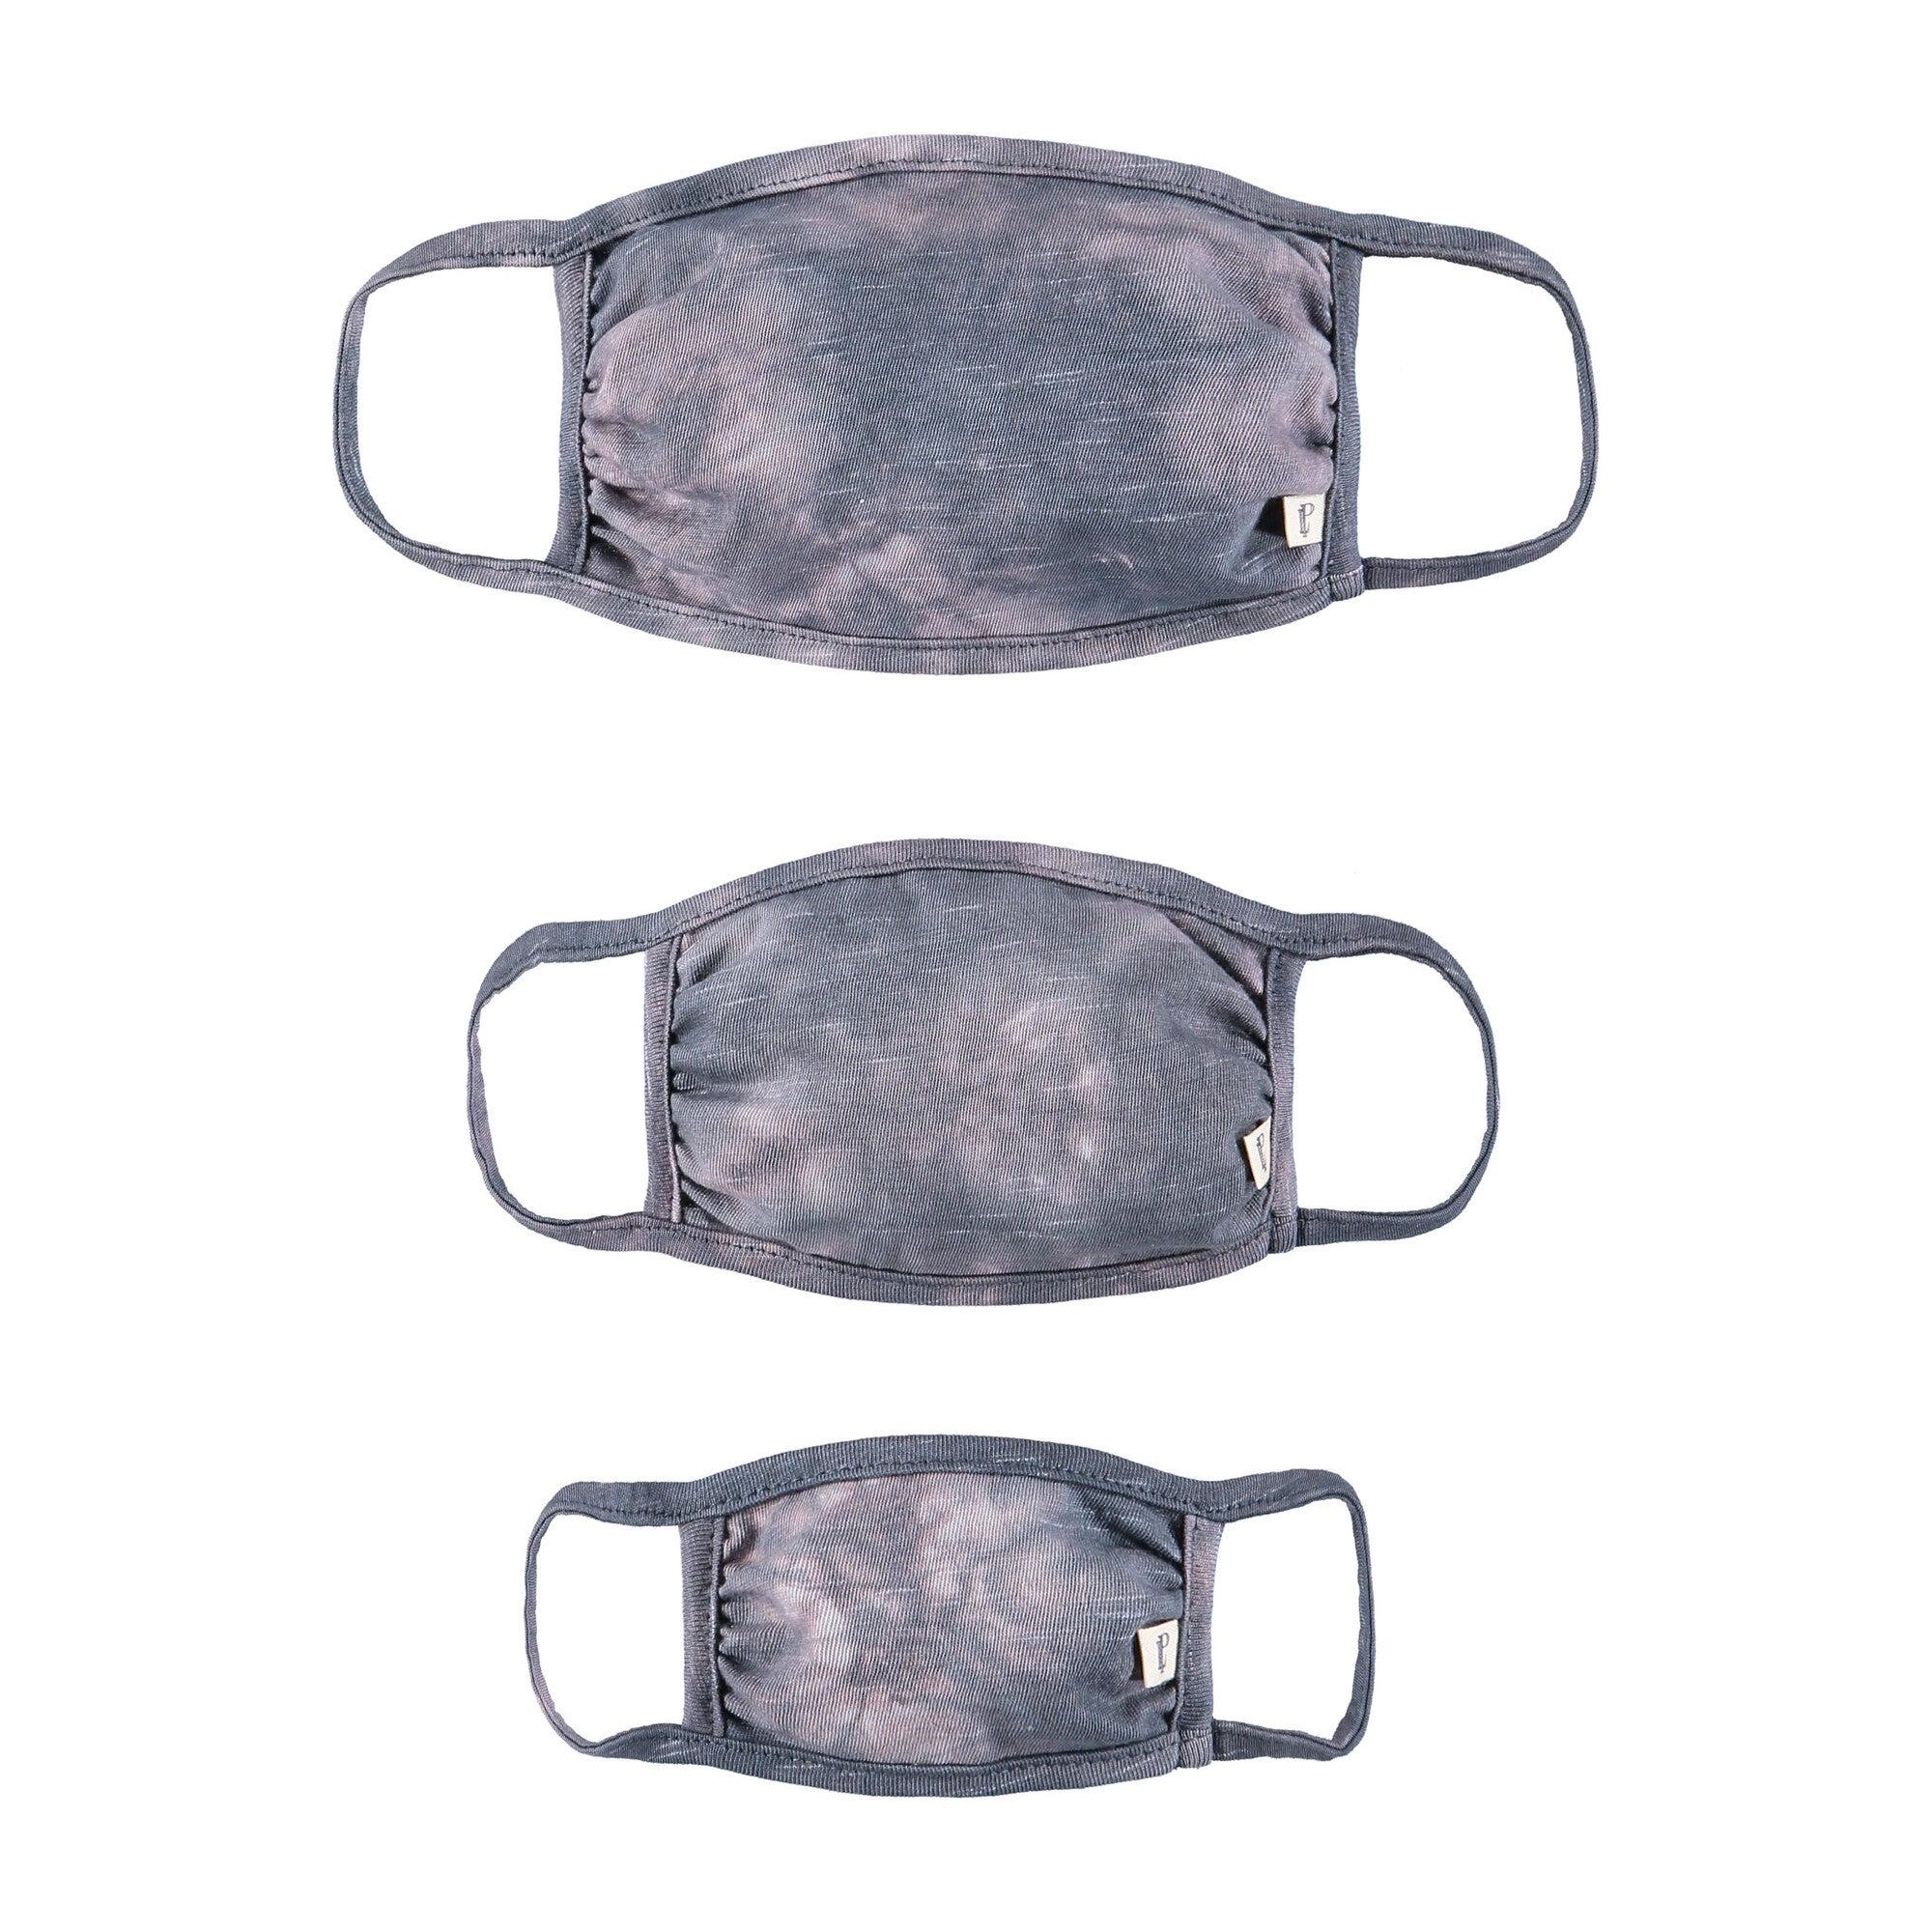 Adult Child & Mini Mask Set, Cloud Tie Dye